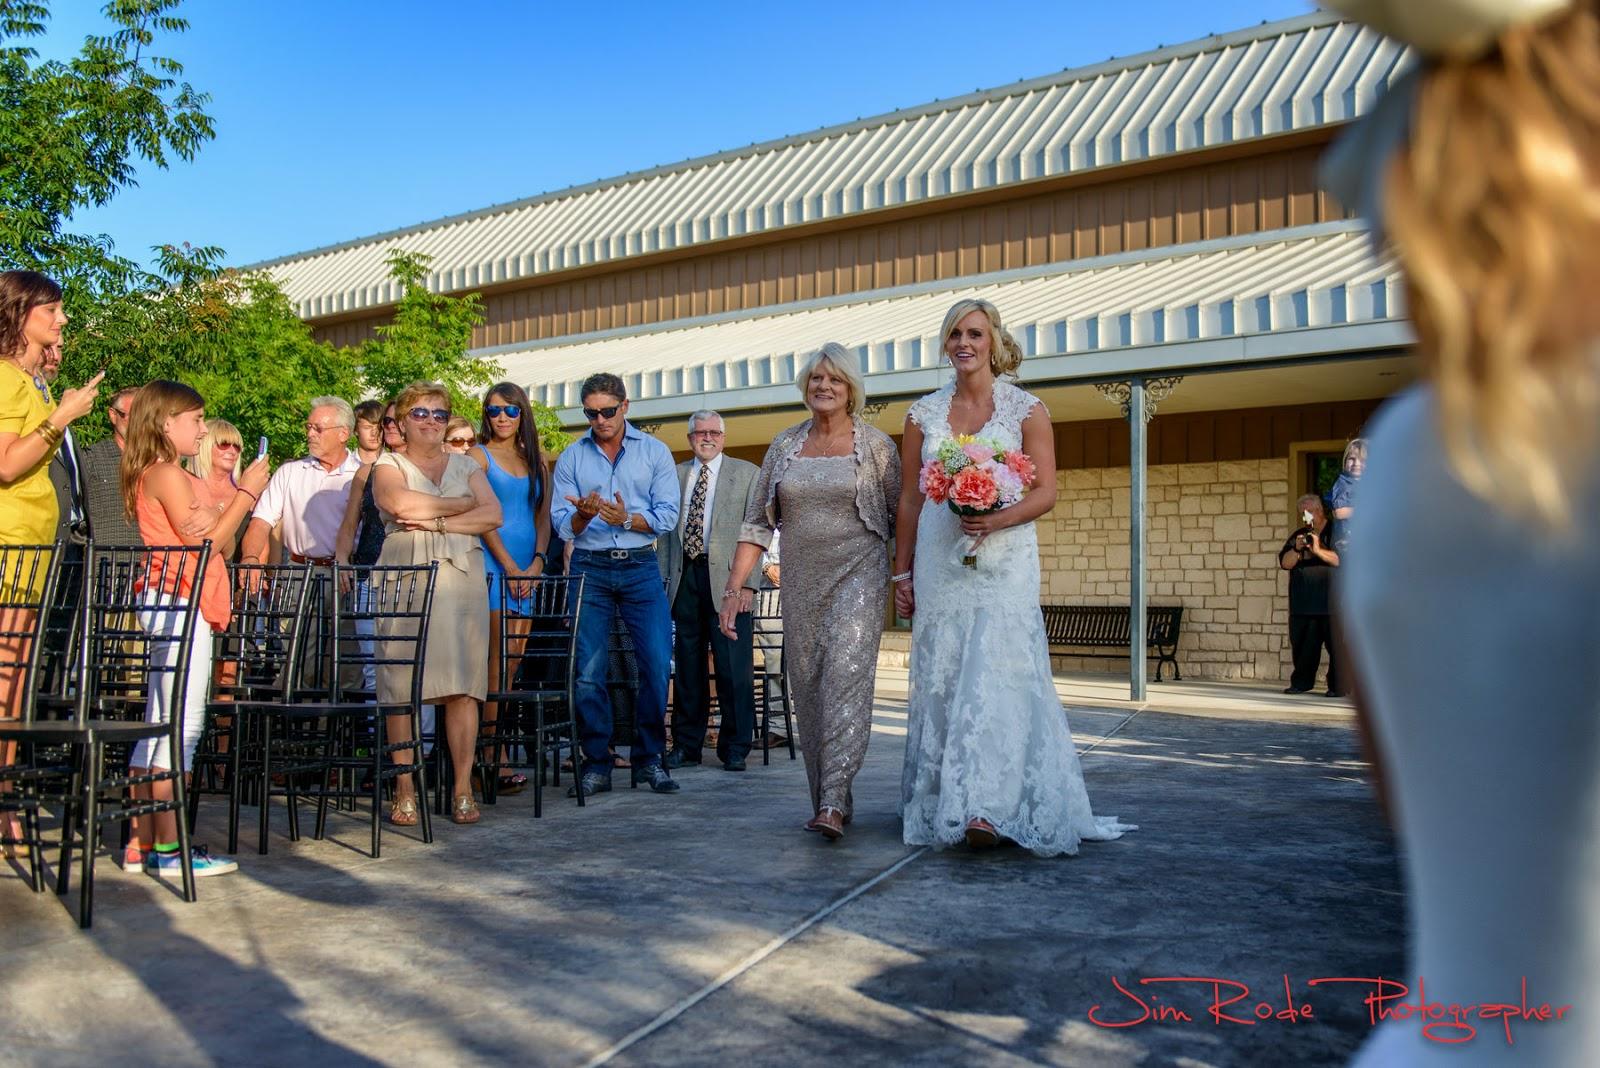 Mom walks the bride down the aisle at her Grand Prairie wedding.